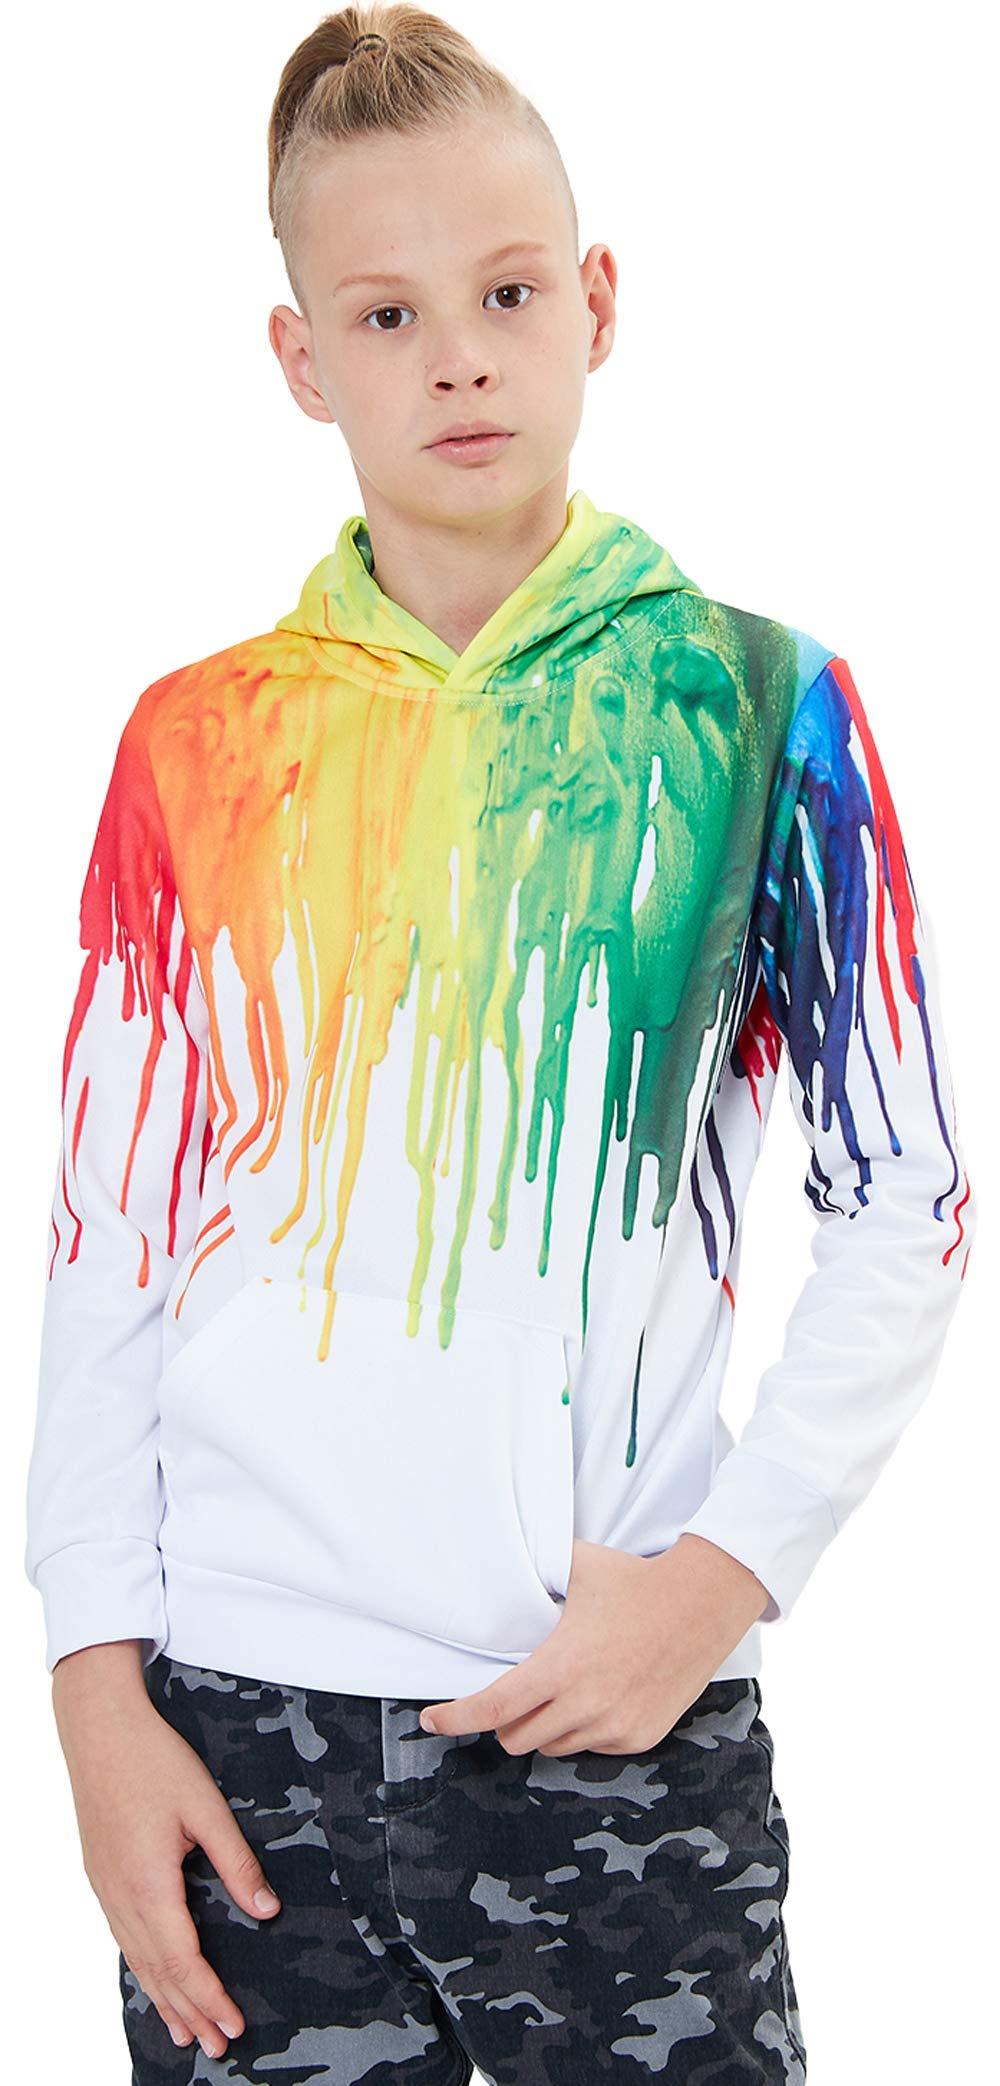 UNICOMIDEA Kid Boy Hoodies Sweatshirt Digital 3D Rainbow Printing Pullover Casual Long-Sleeve Jacket with Pocket Size M